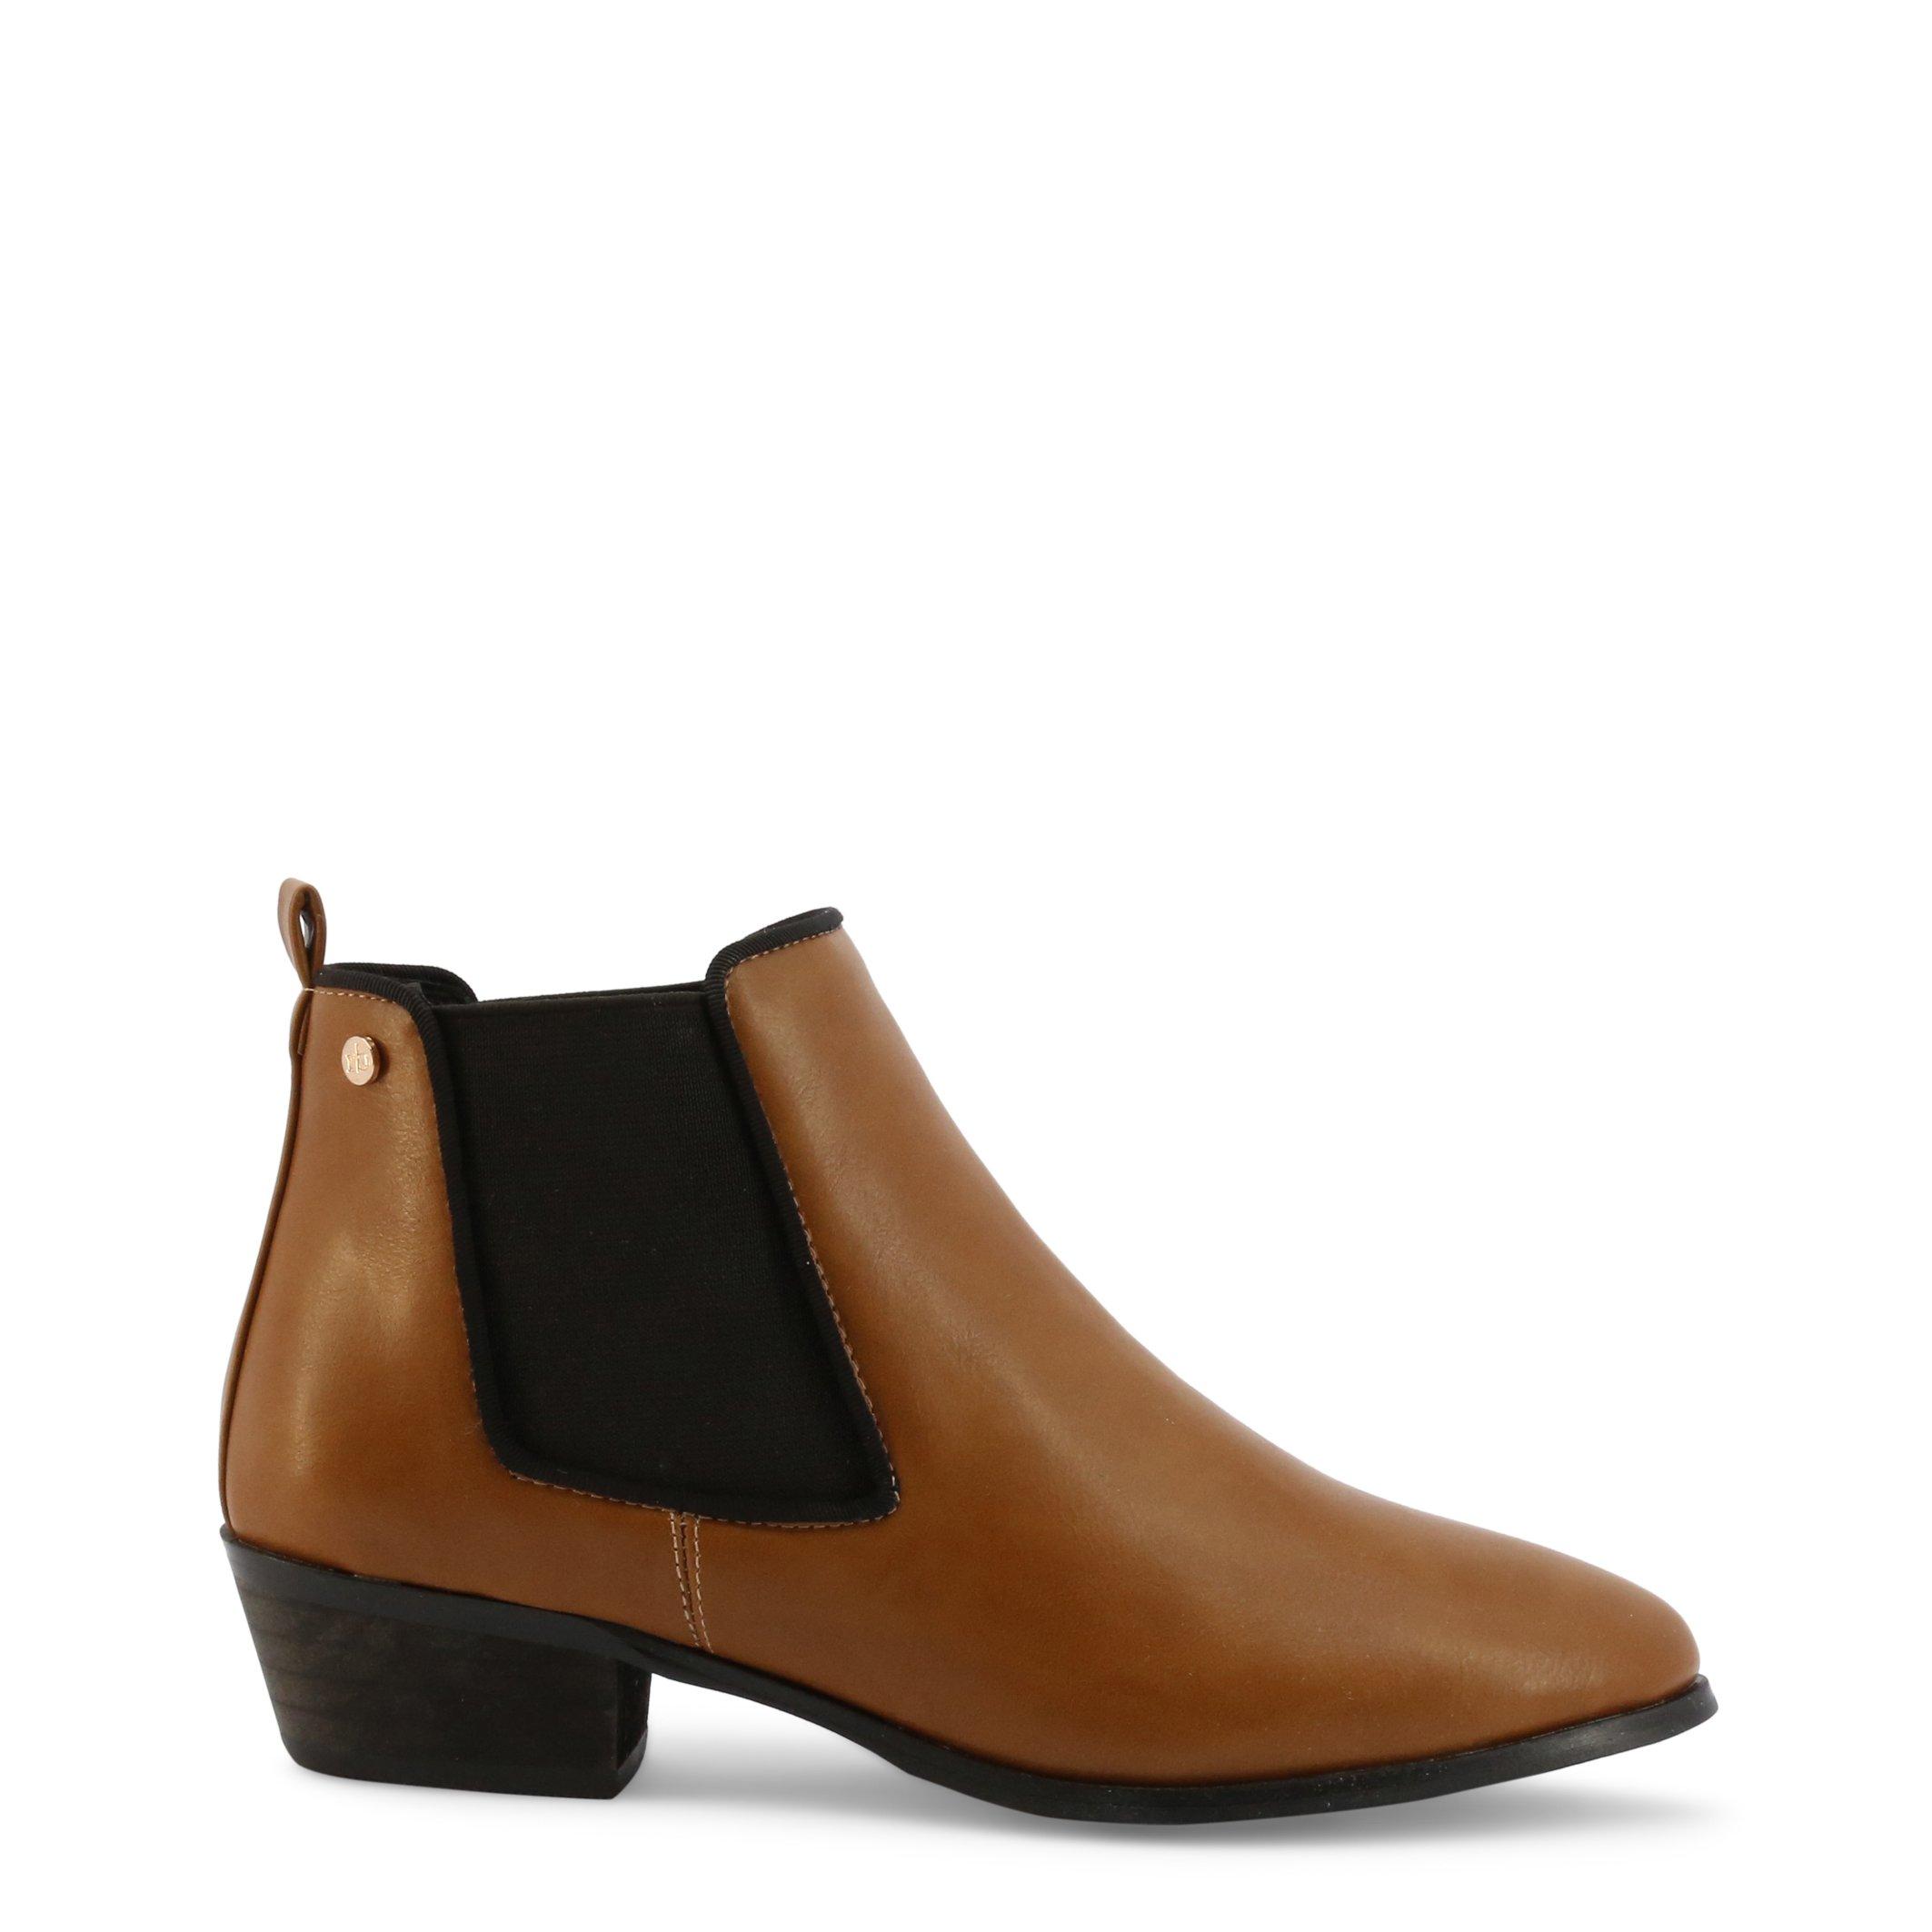 Roccobarocco Women's Ankle Boot Various Colours RBSC1JJ02VIT - brown EU 37